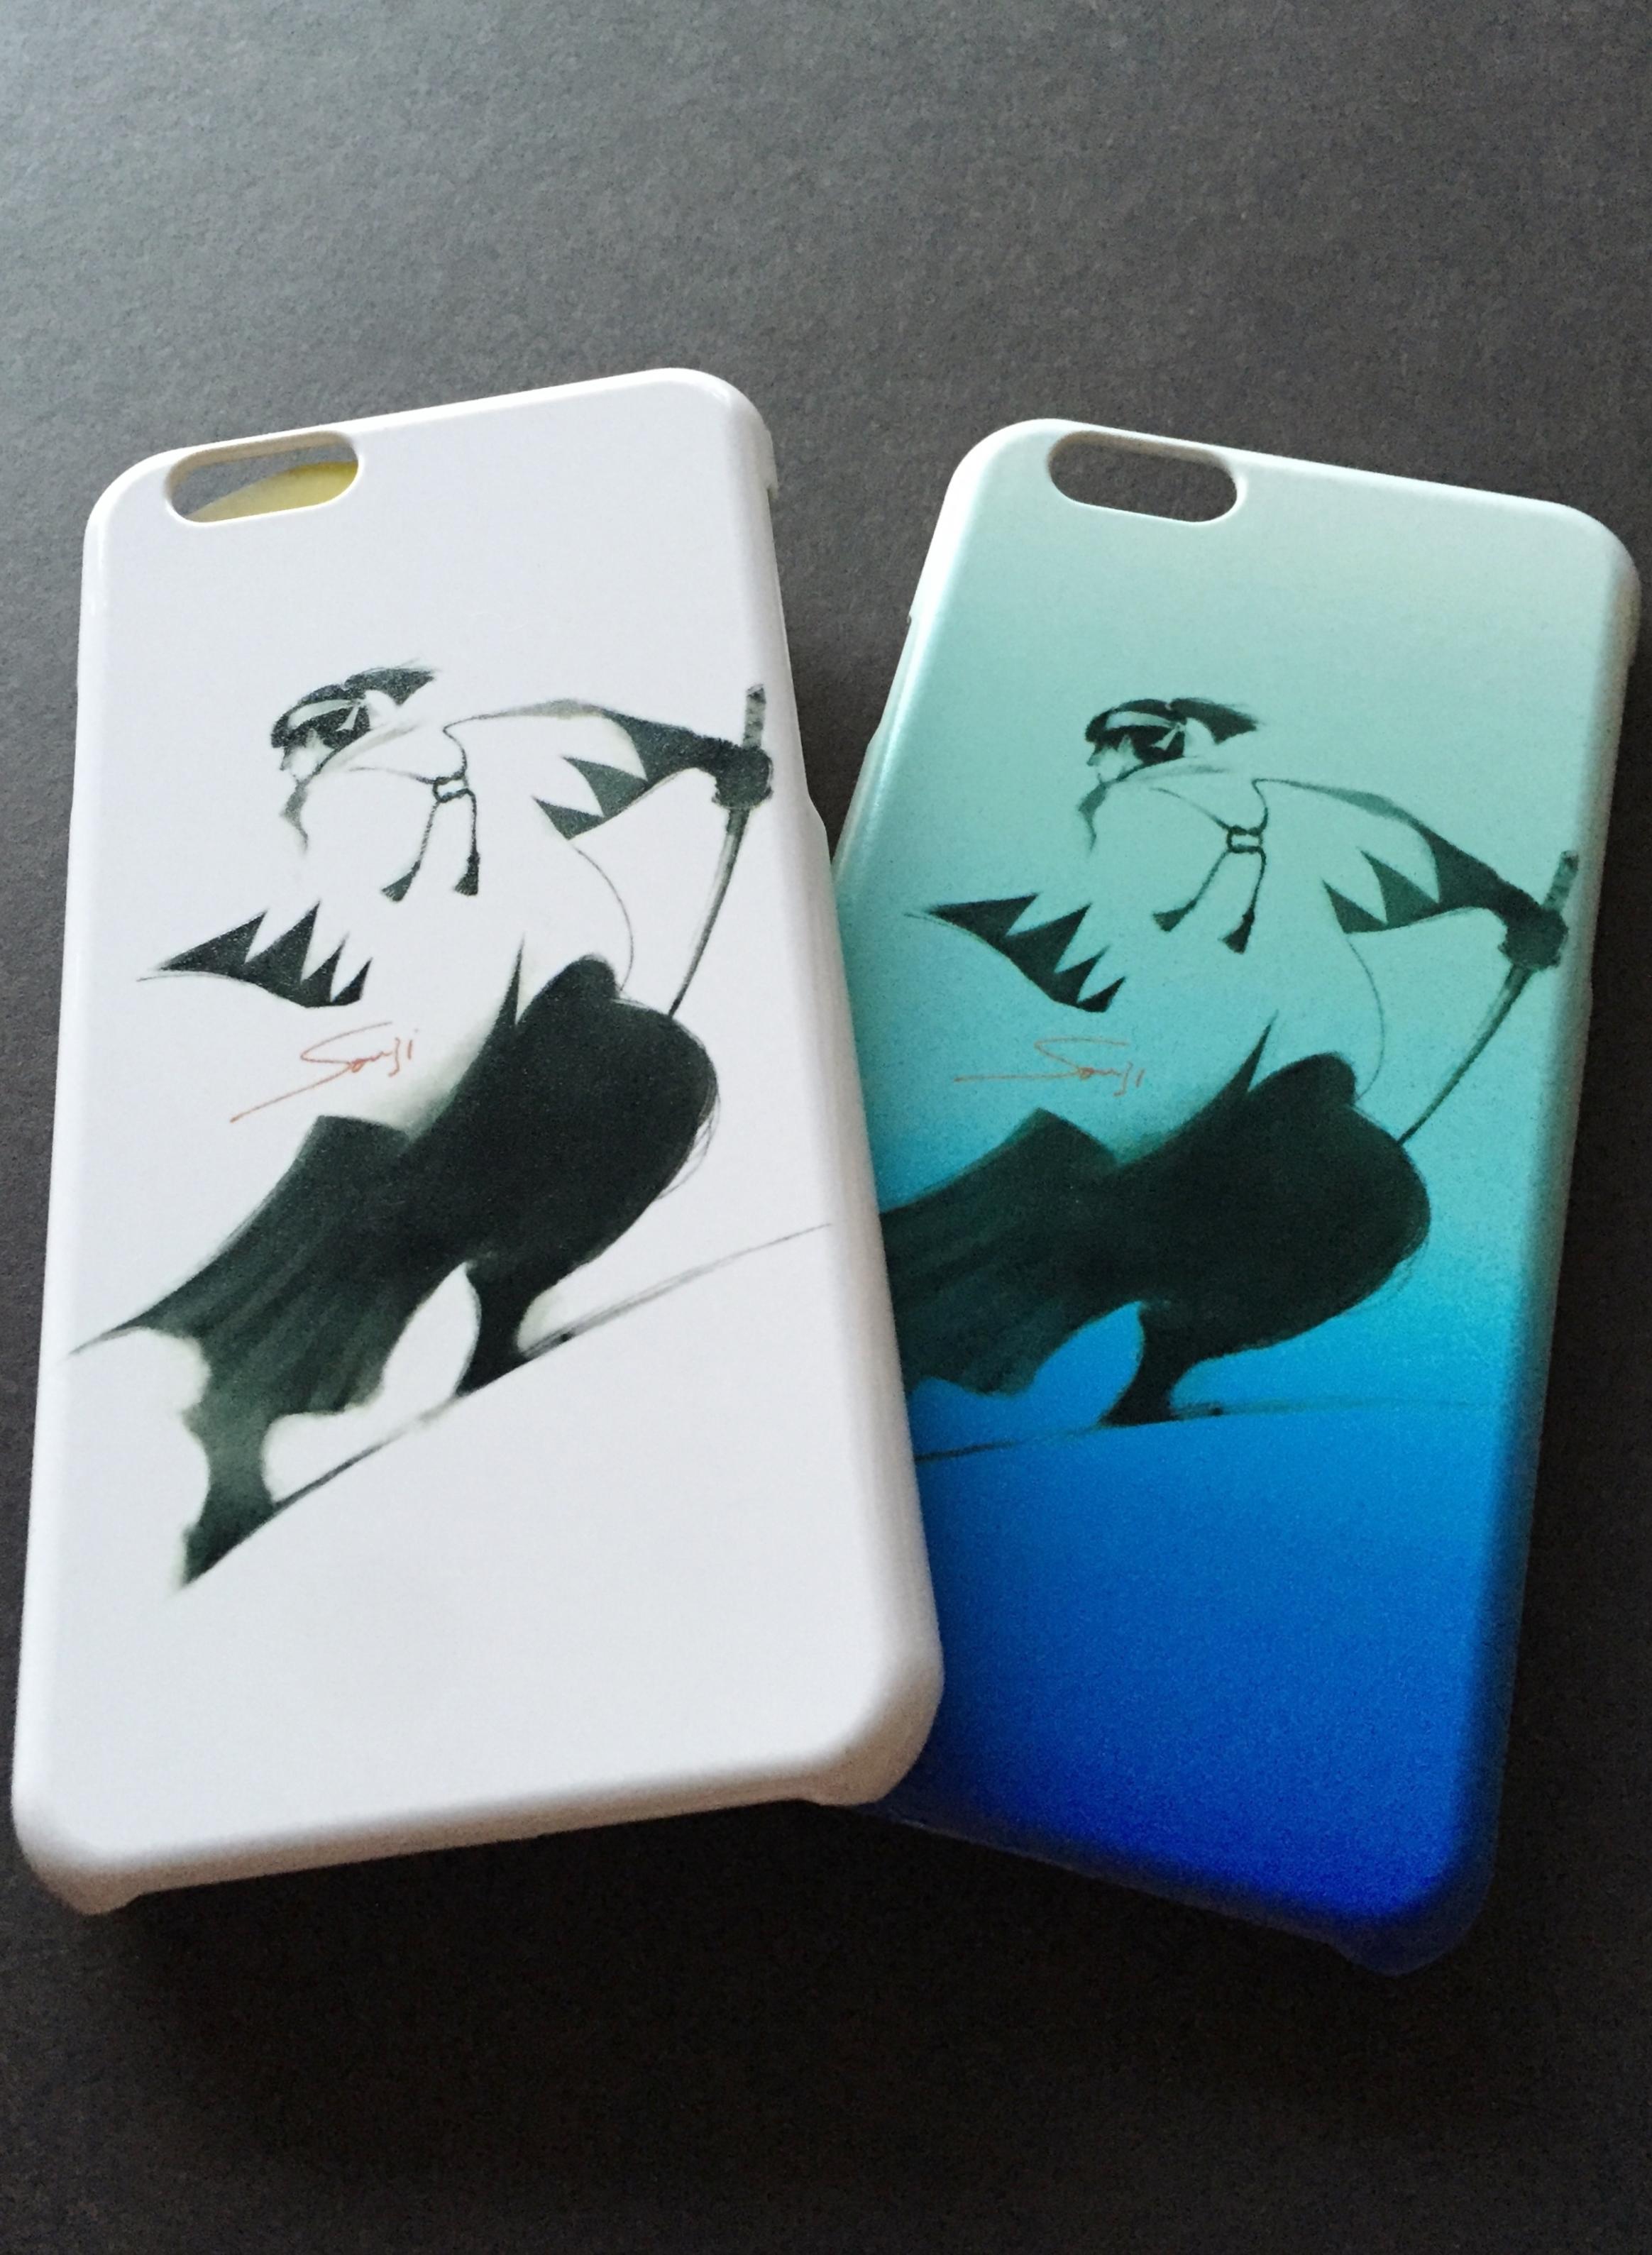 新選組 沖田総司iPhoneケース(iPhone6s/6対応)